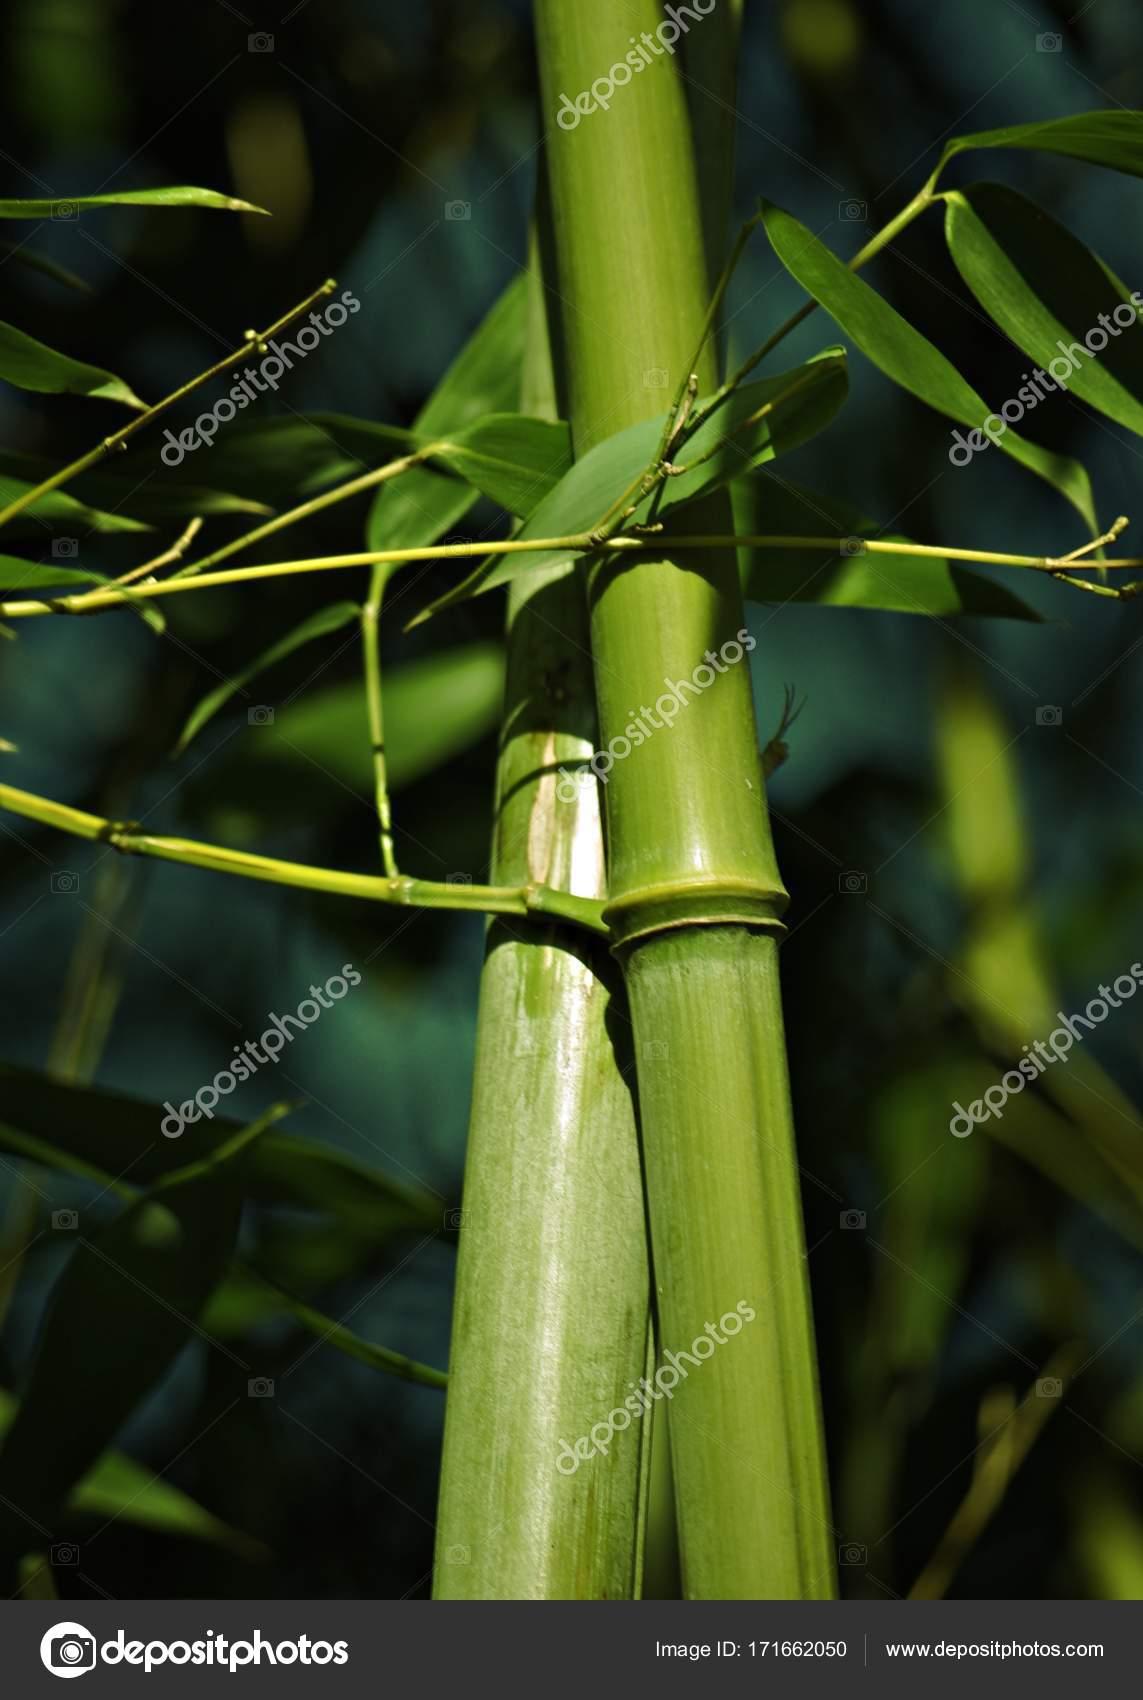 bambus staebe gruen photographie gabii40 171662050. Black Bedroom Furniture Sets. Home Design Ideas